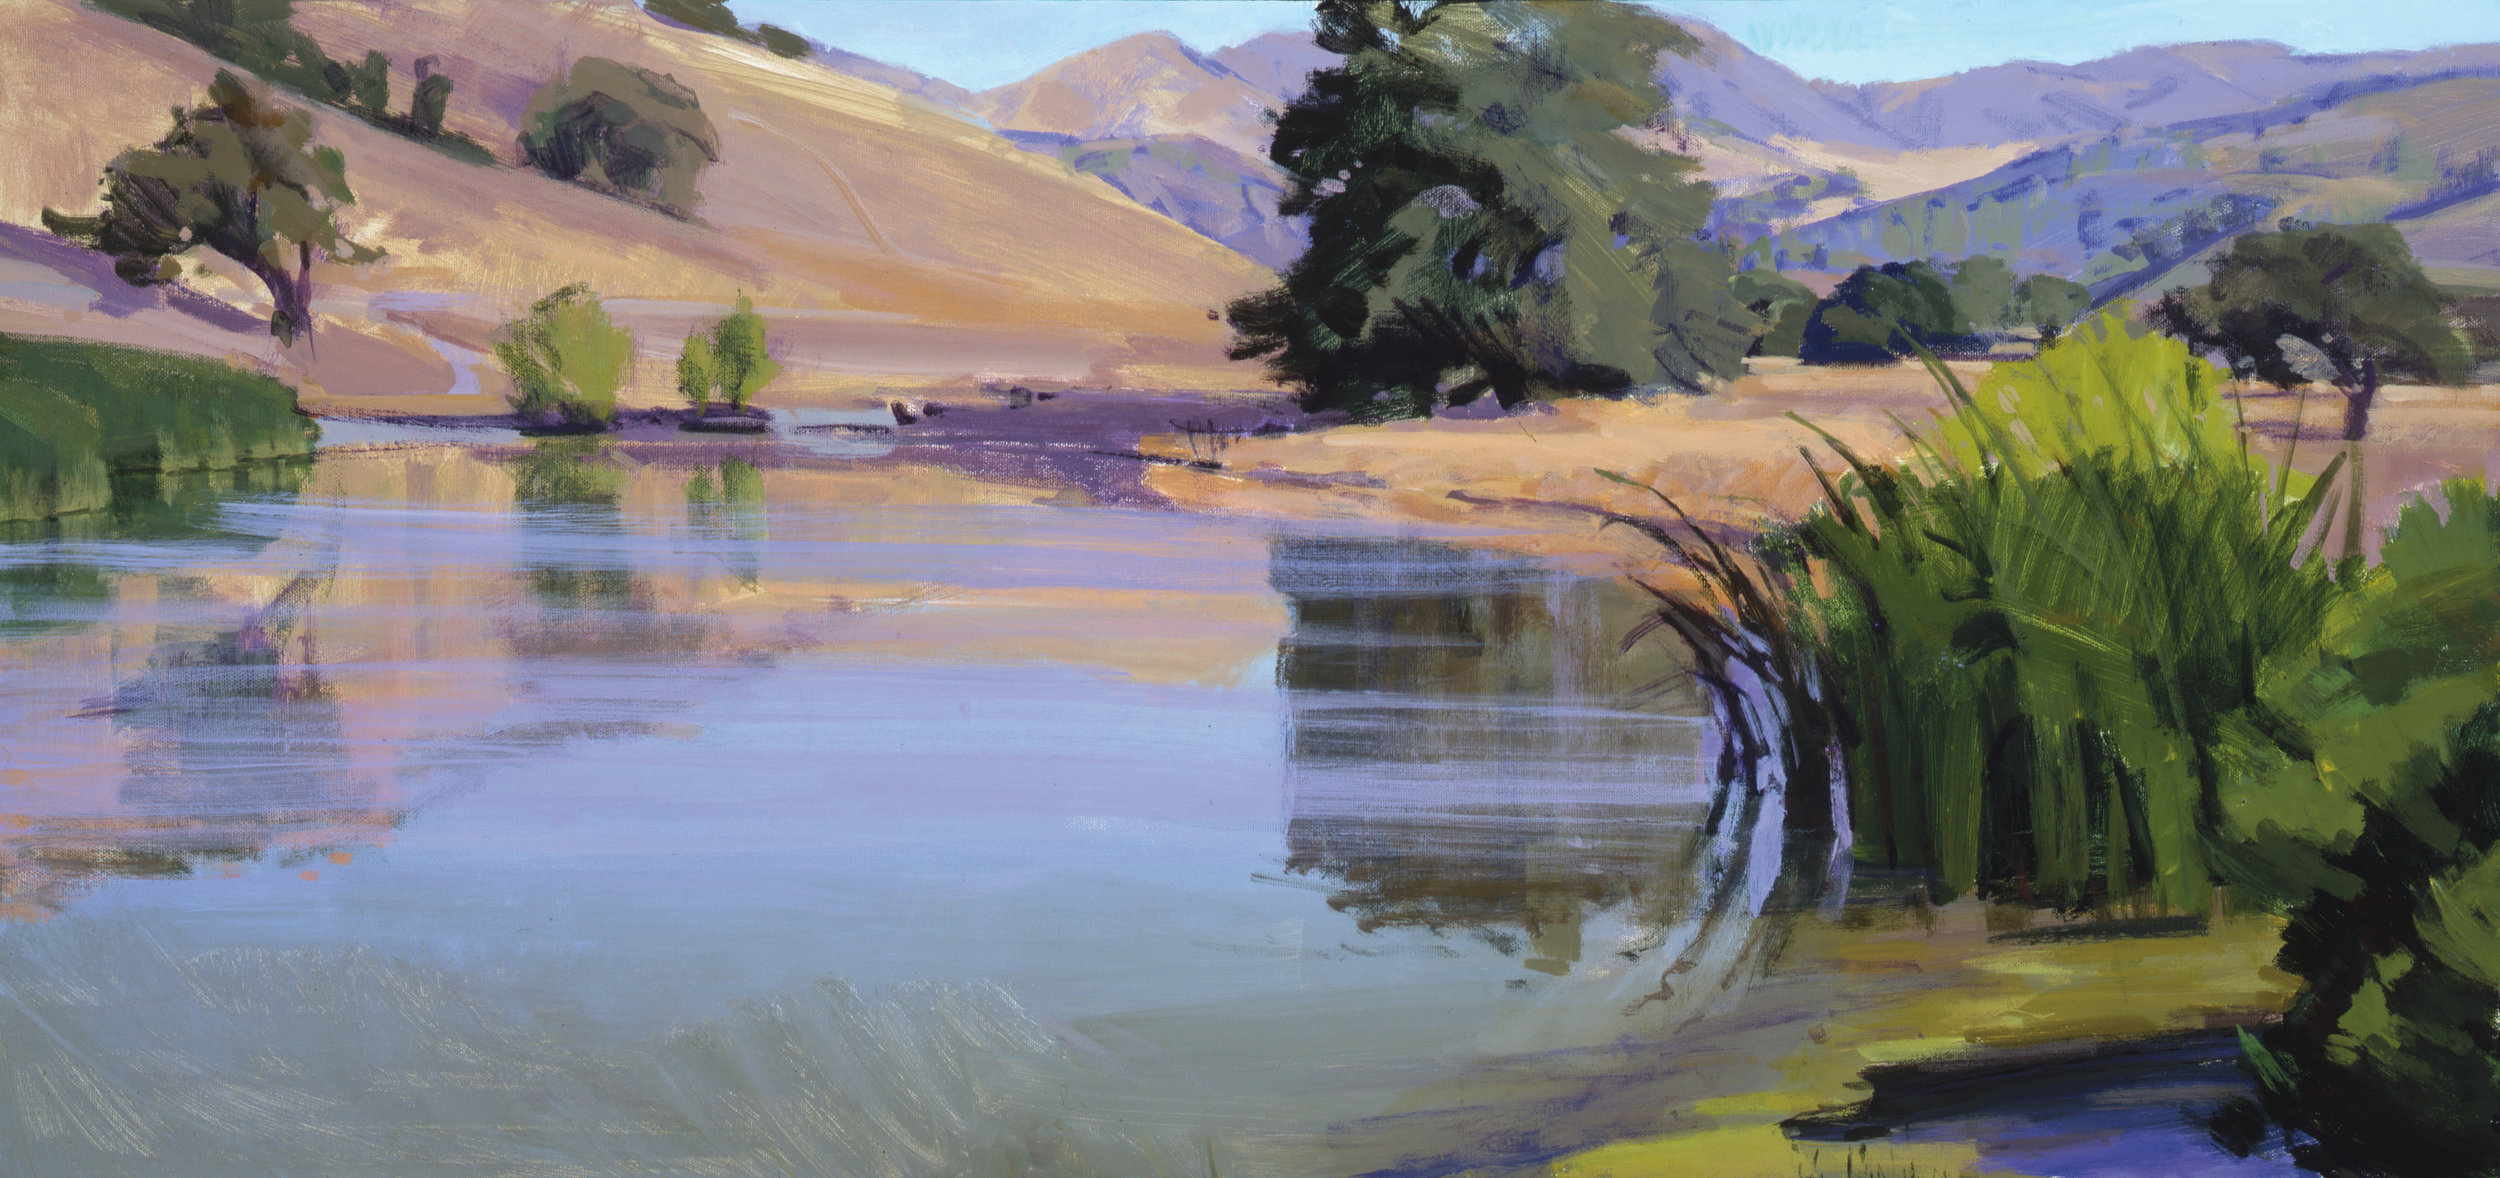 Morning on the Pond, Sedgwick, acrylic, Marcia Burtt